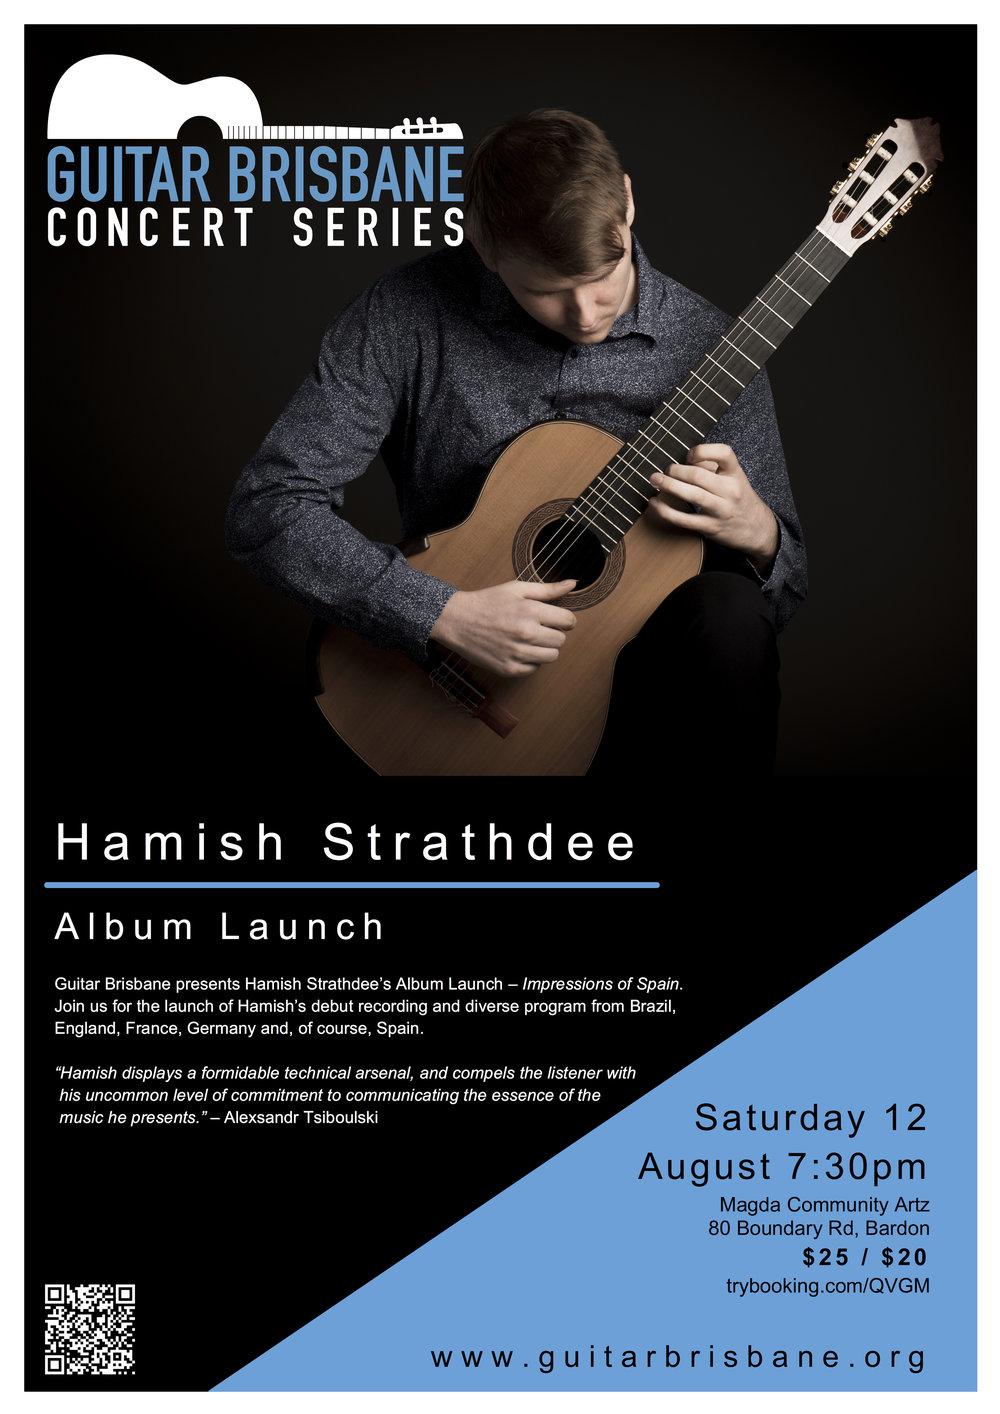 A3 poster Hamish Strathdee 2.jpg